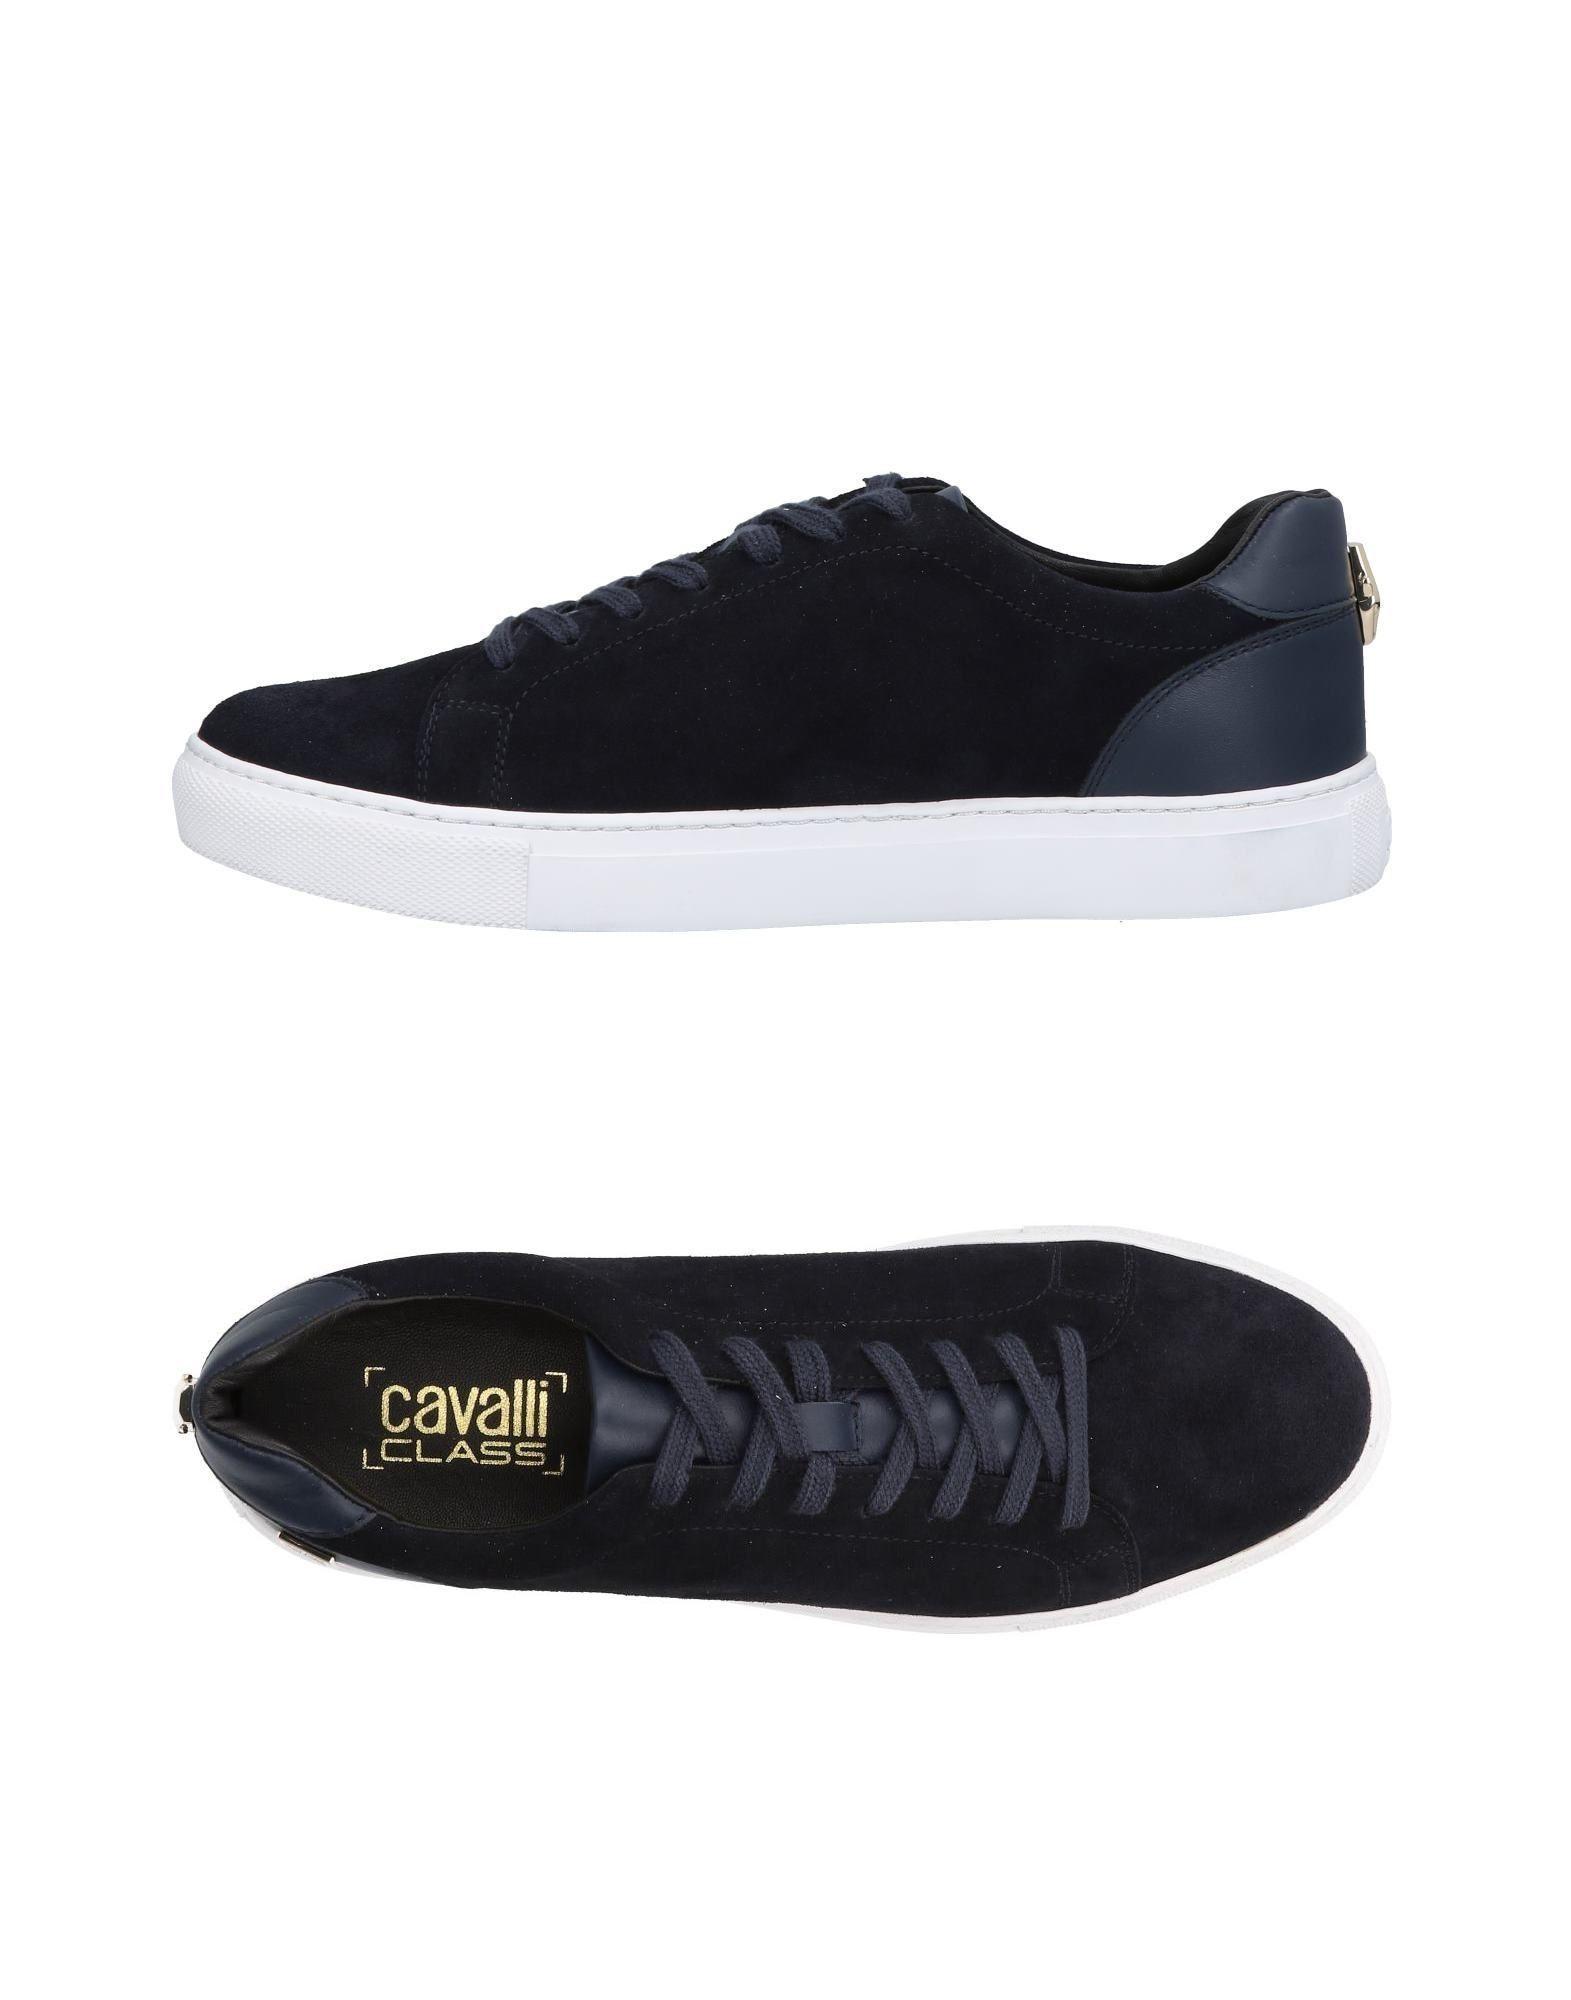 Class Roberto Cavalli Sneakers In Dark Blue